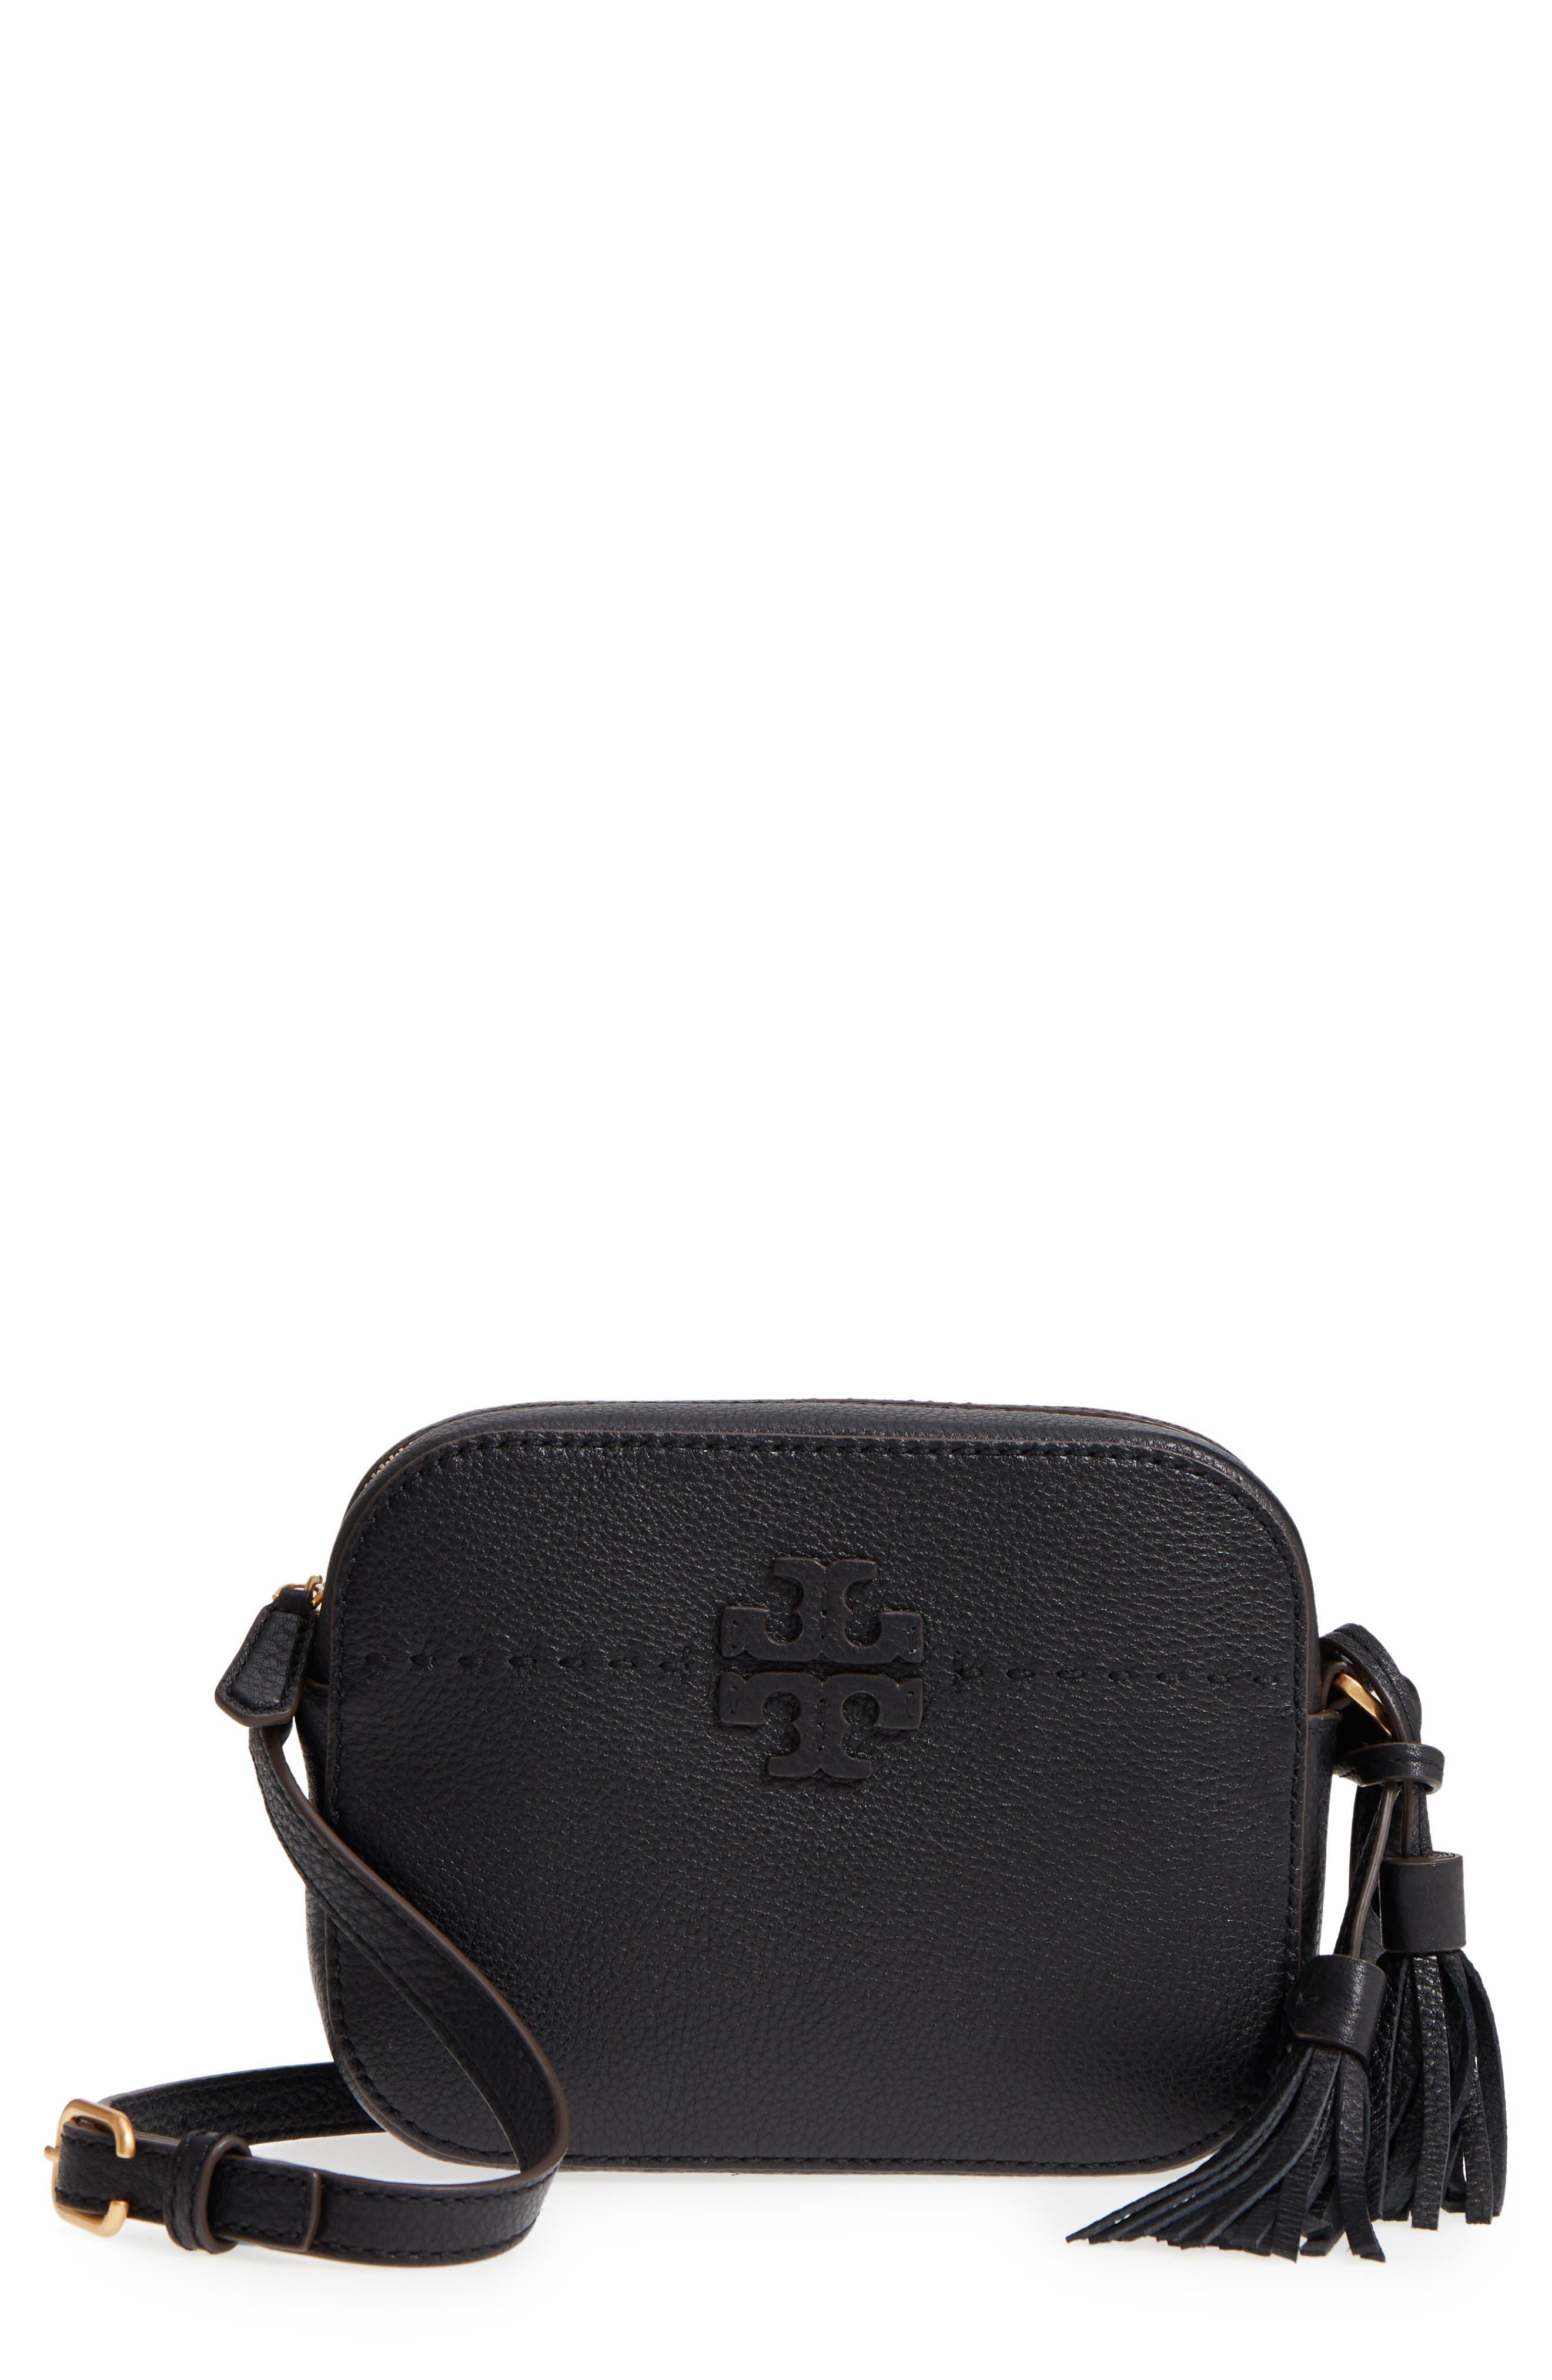 McGraw Leather Camera Bag,                         Main,                         color, 001